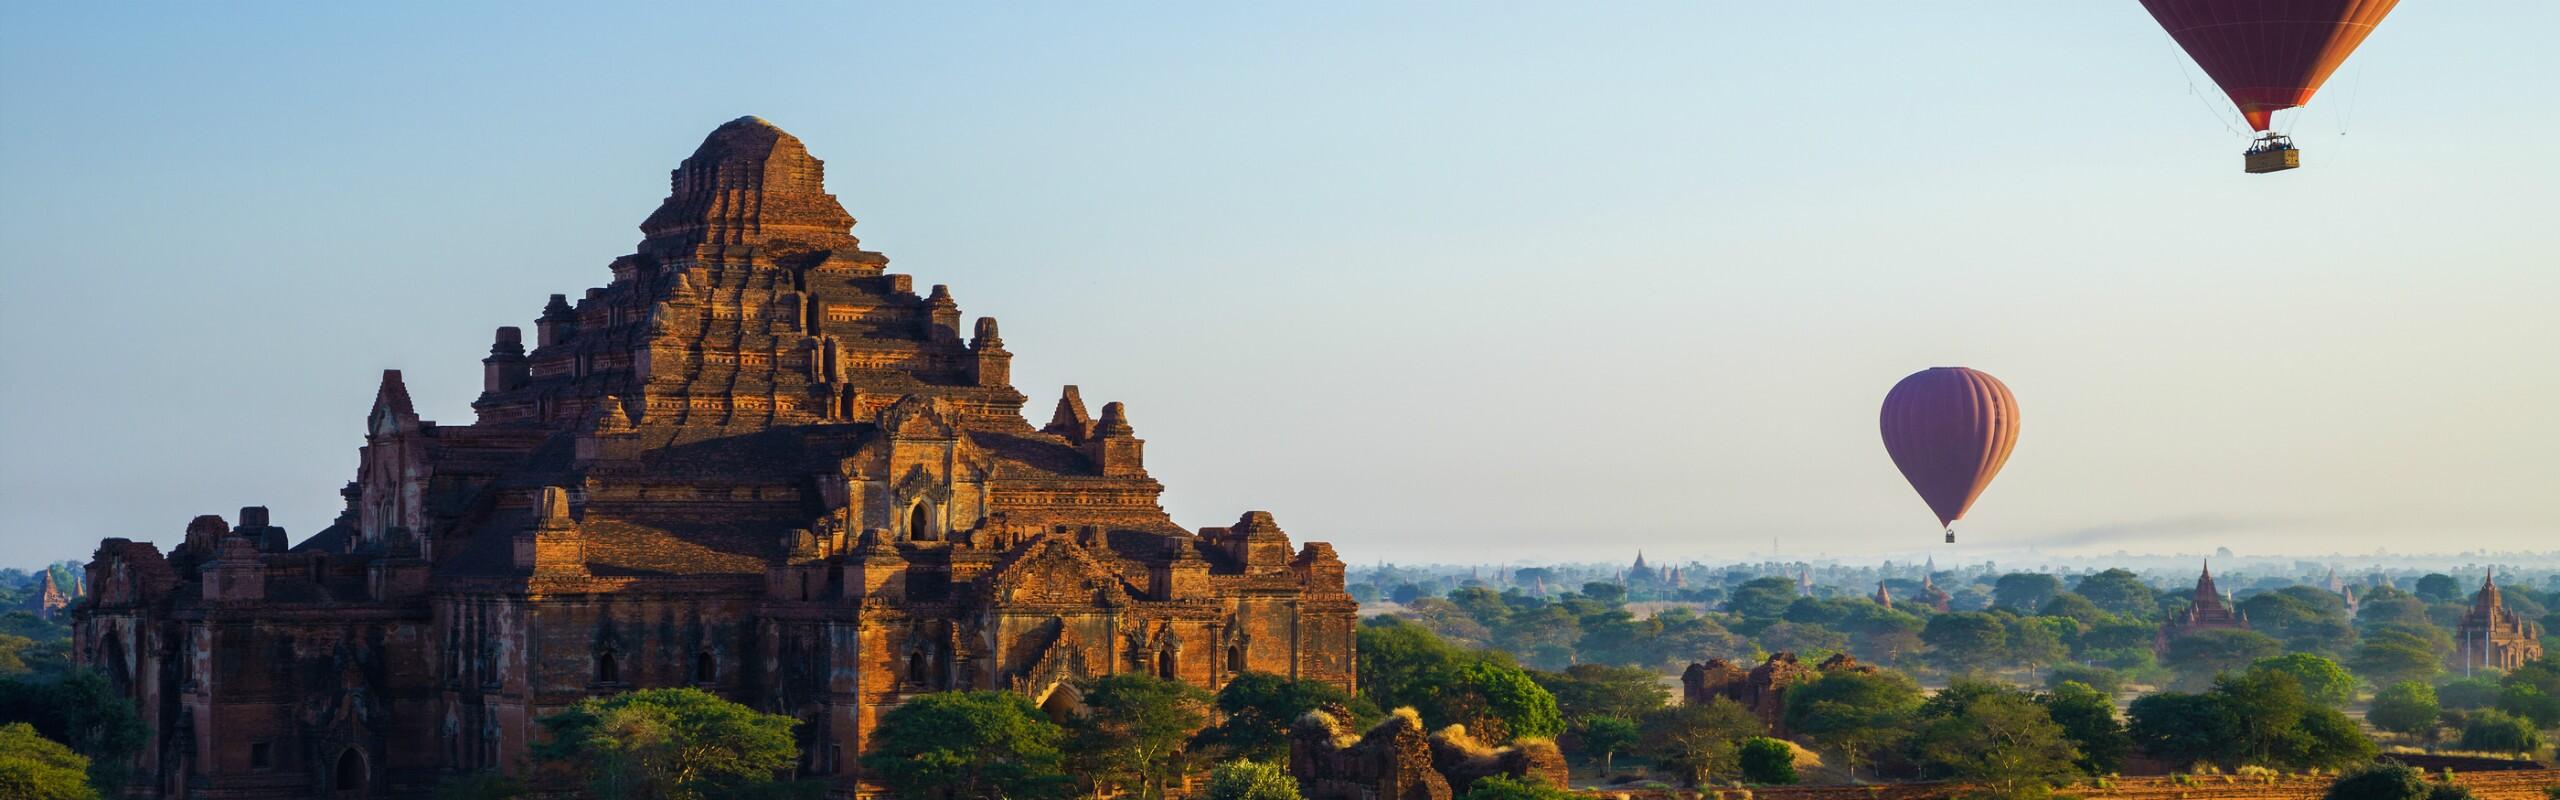 April Weather in Bagan - Hot Season Starts